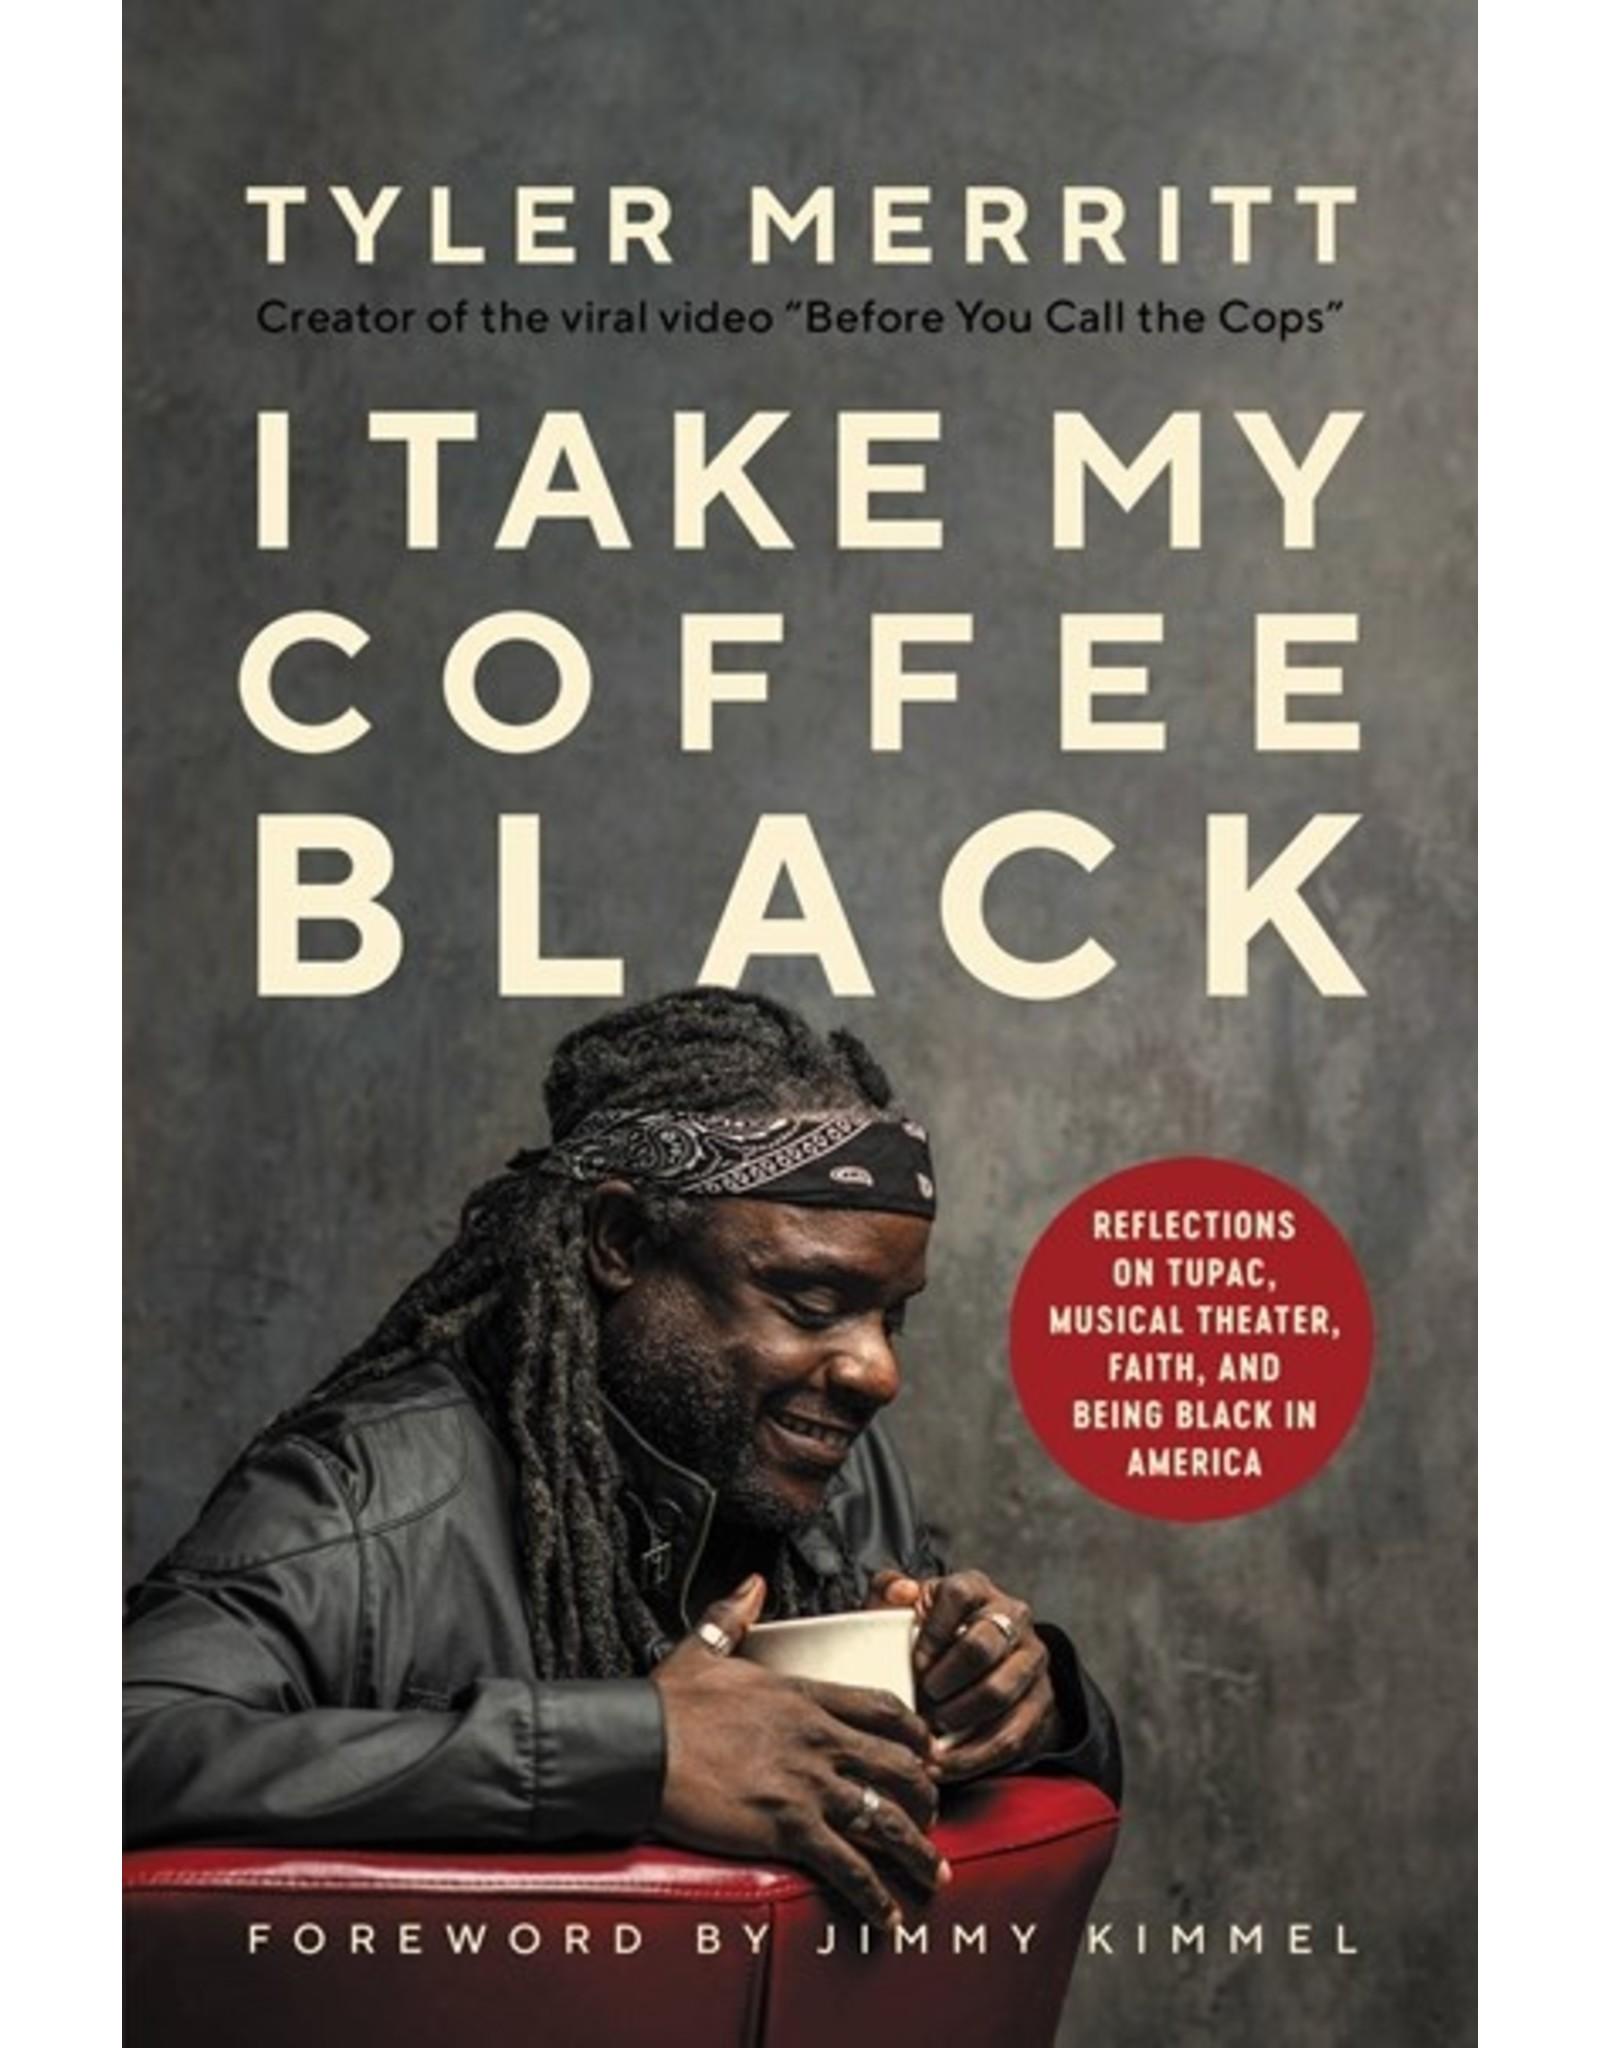 Books I Take My Coffee Black by  Tyler Merritt